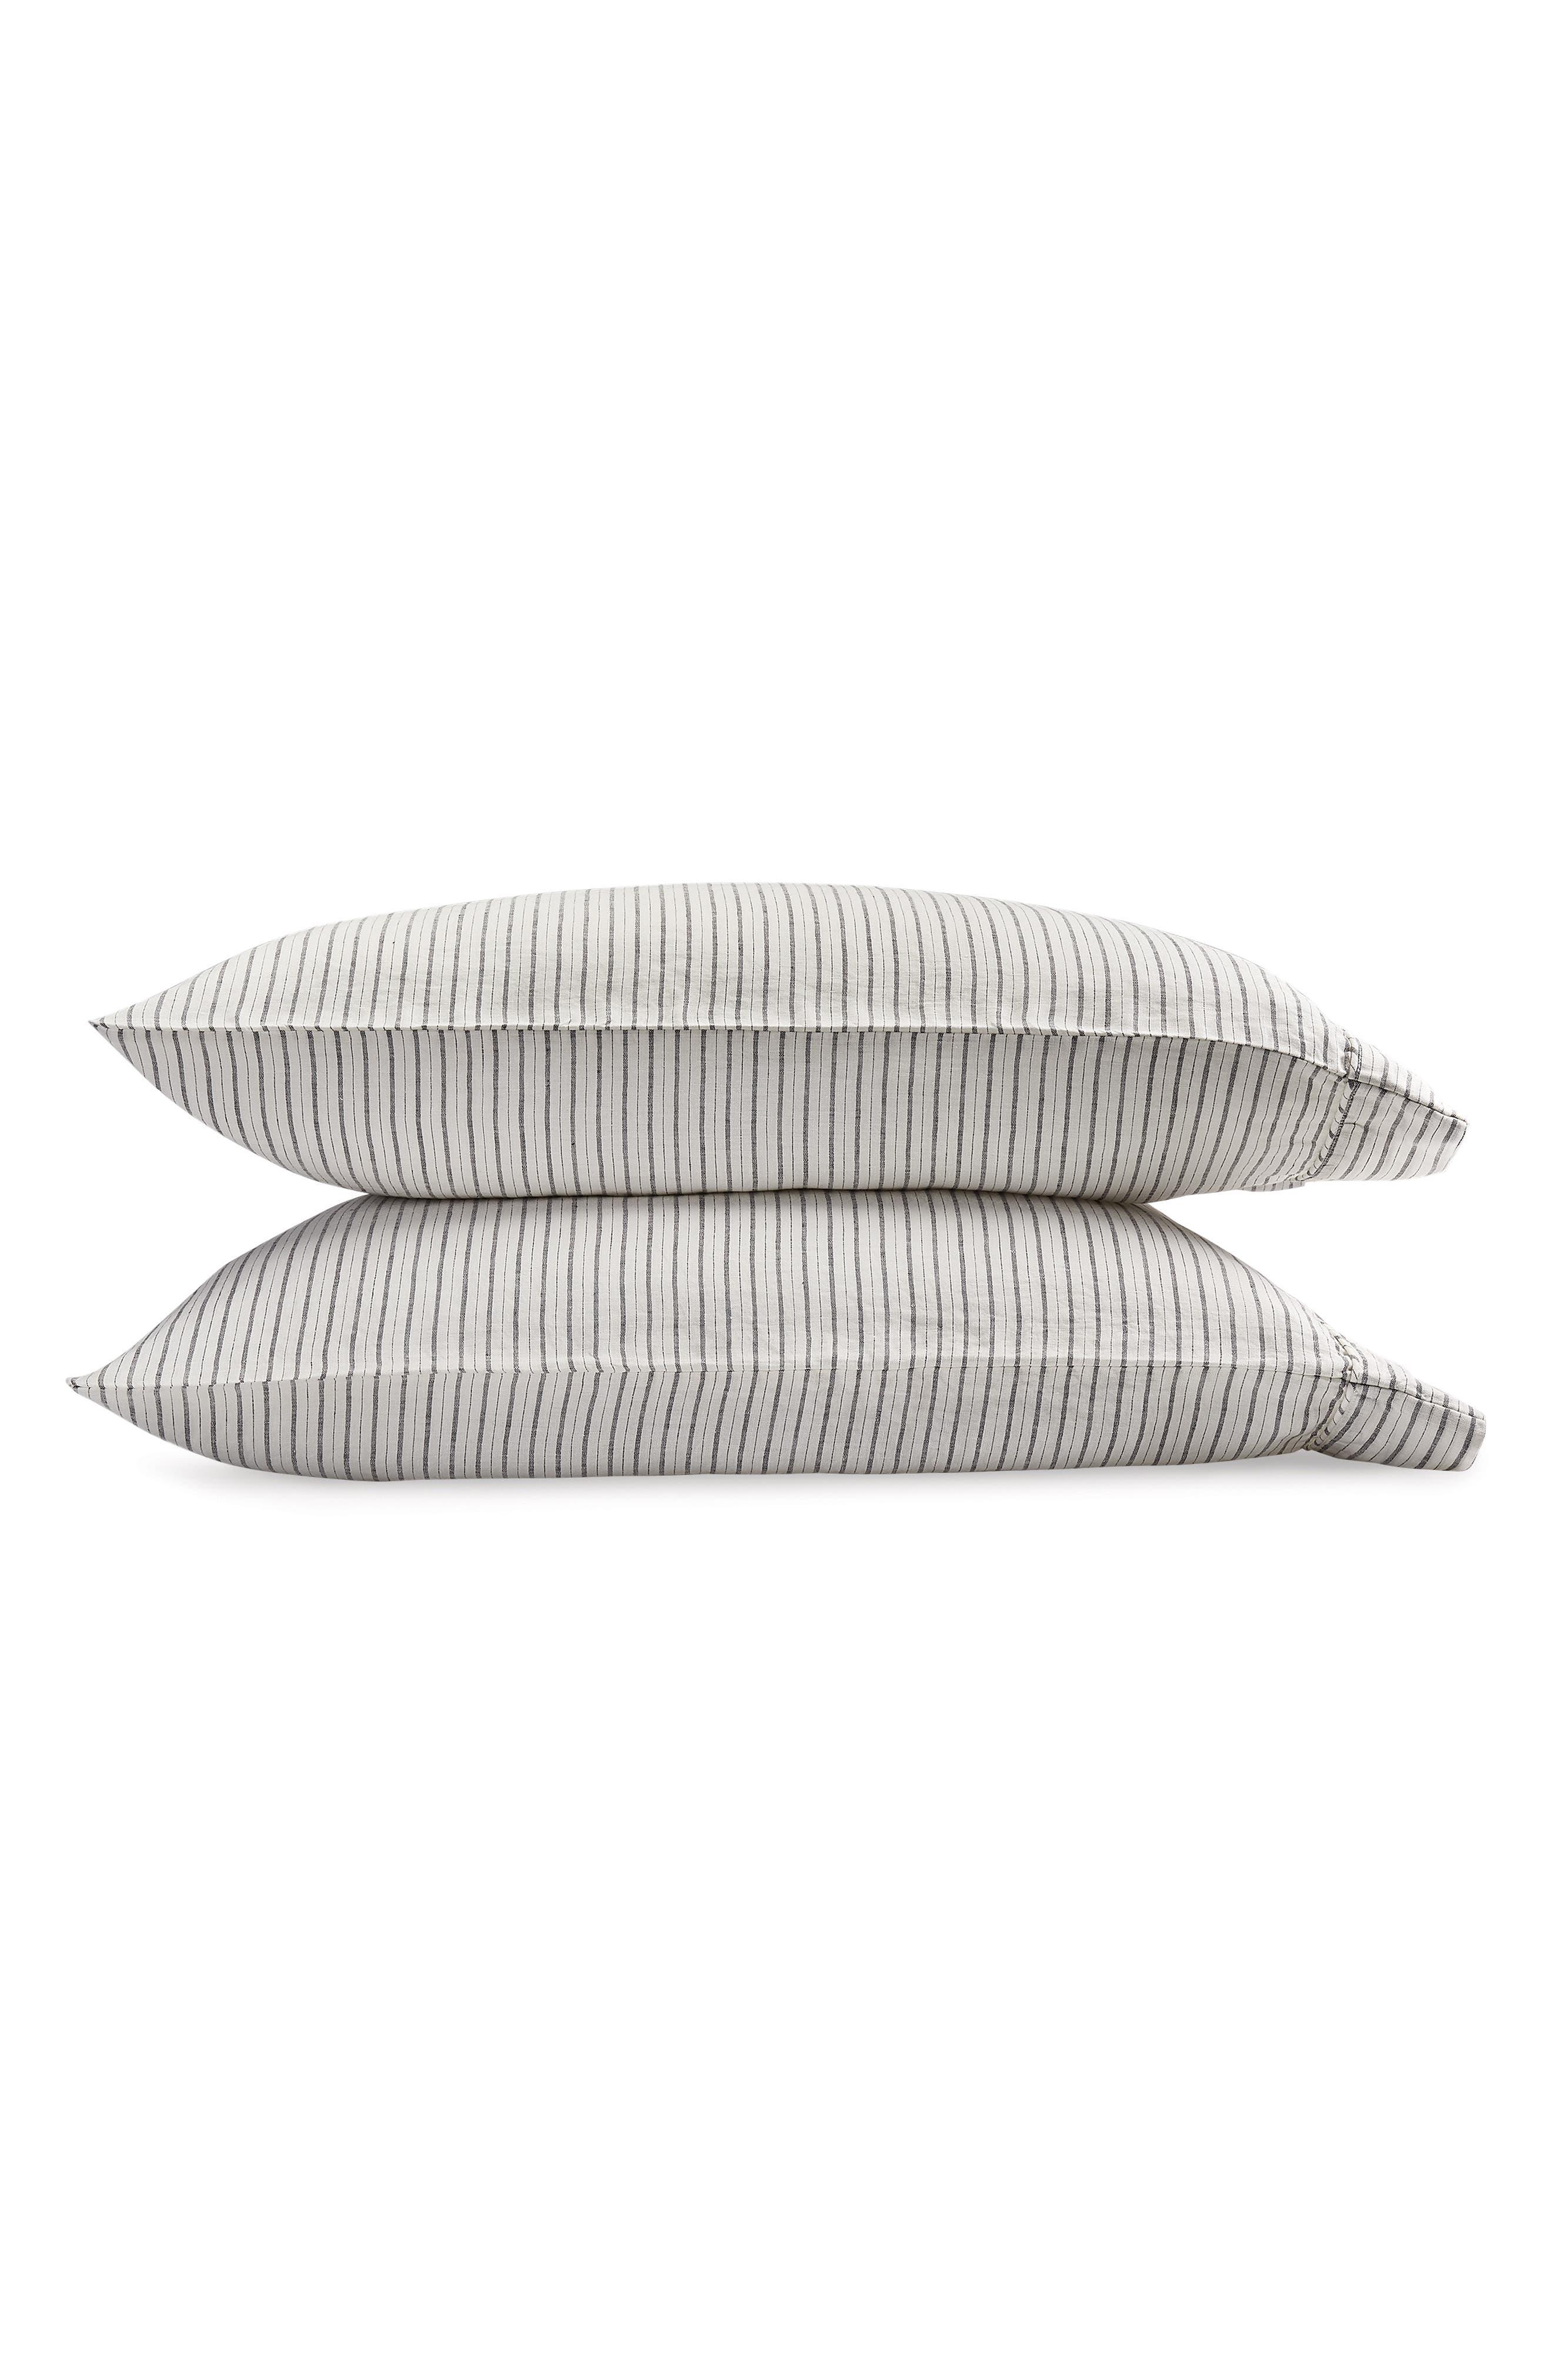 Matouk Tristen Set Of 2 Linen Pillowcases Size King  White